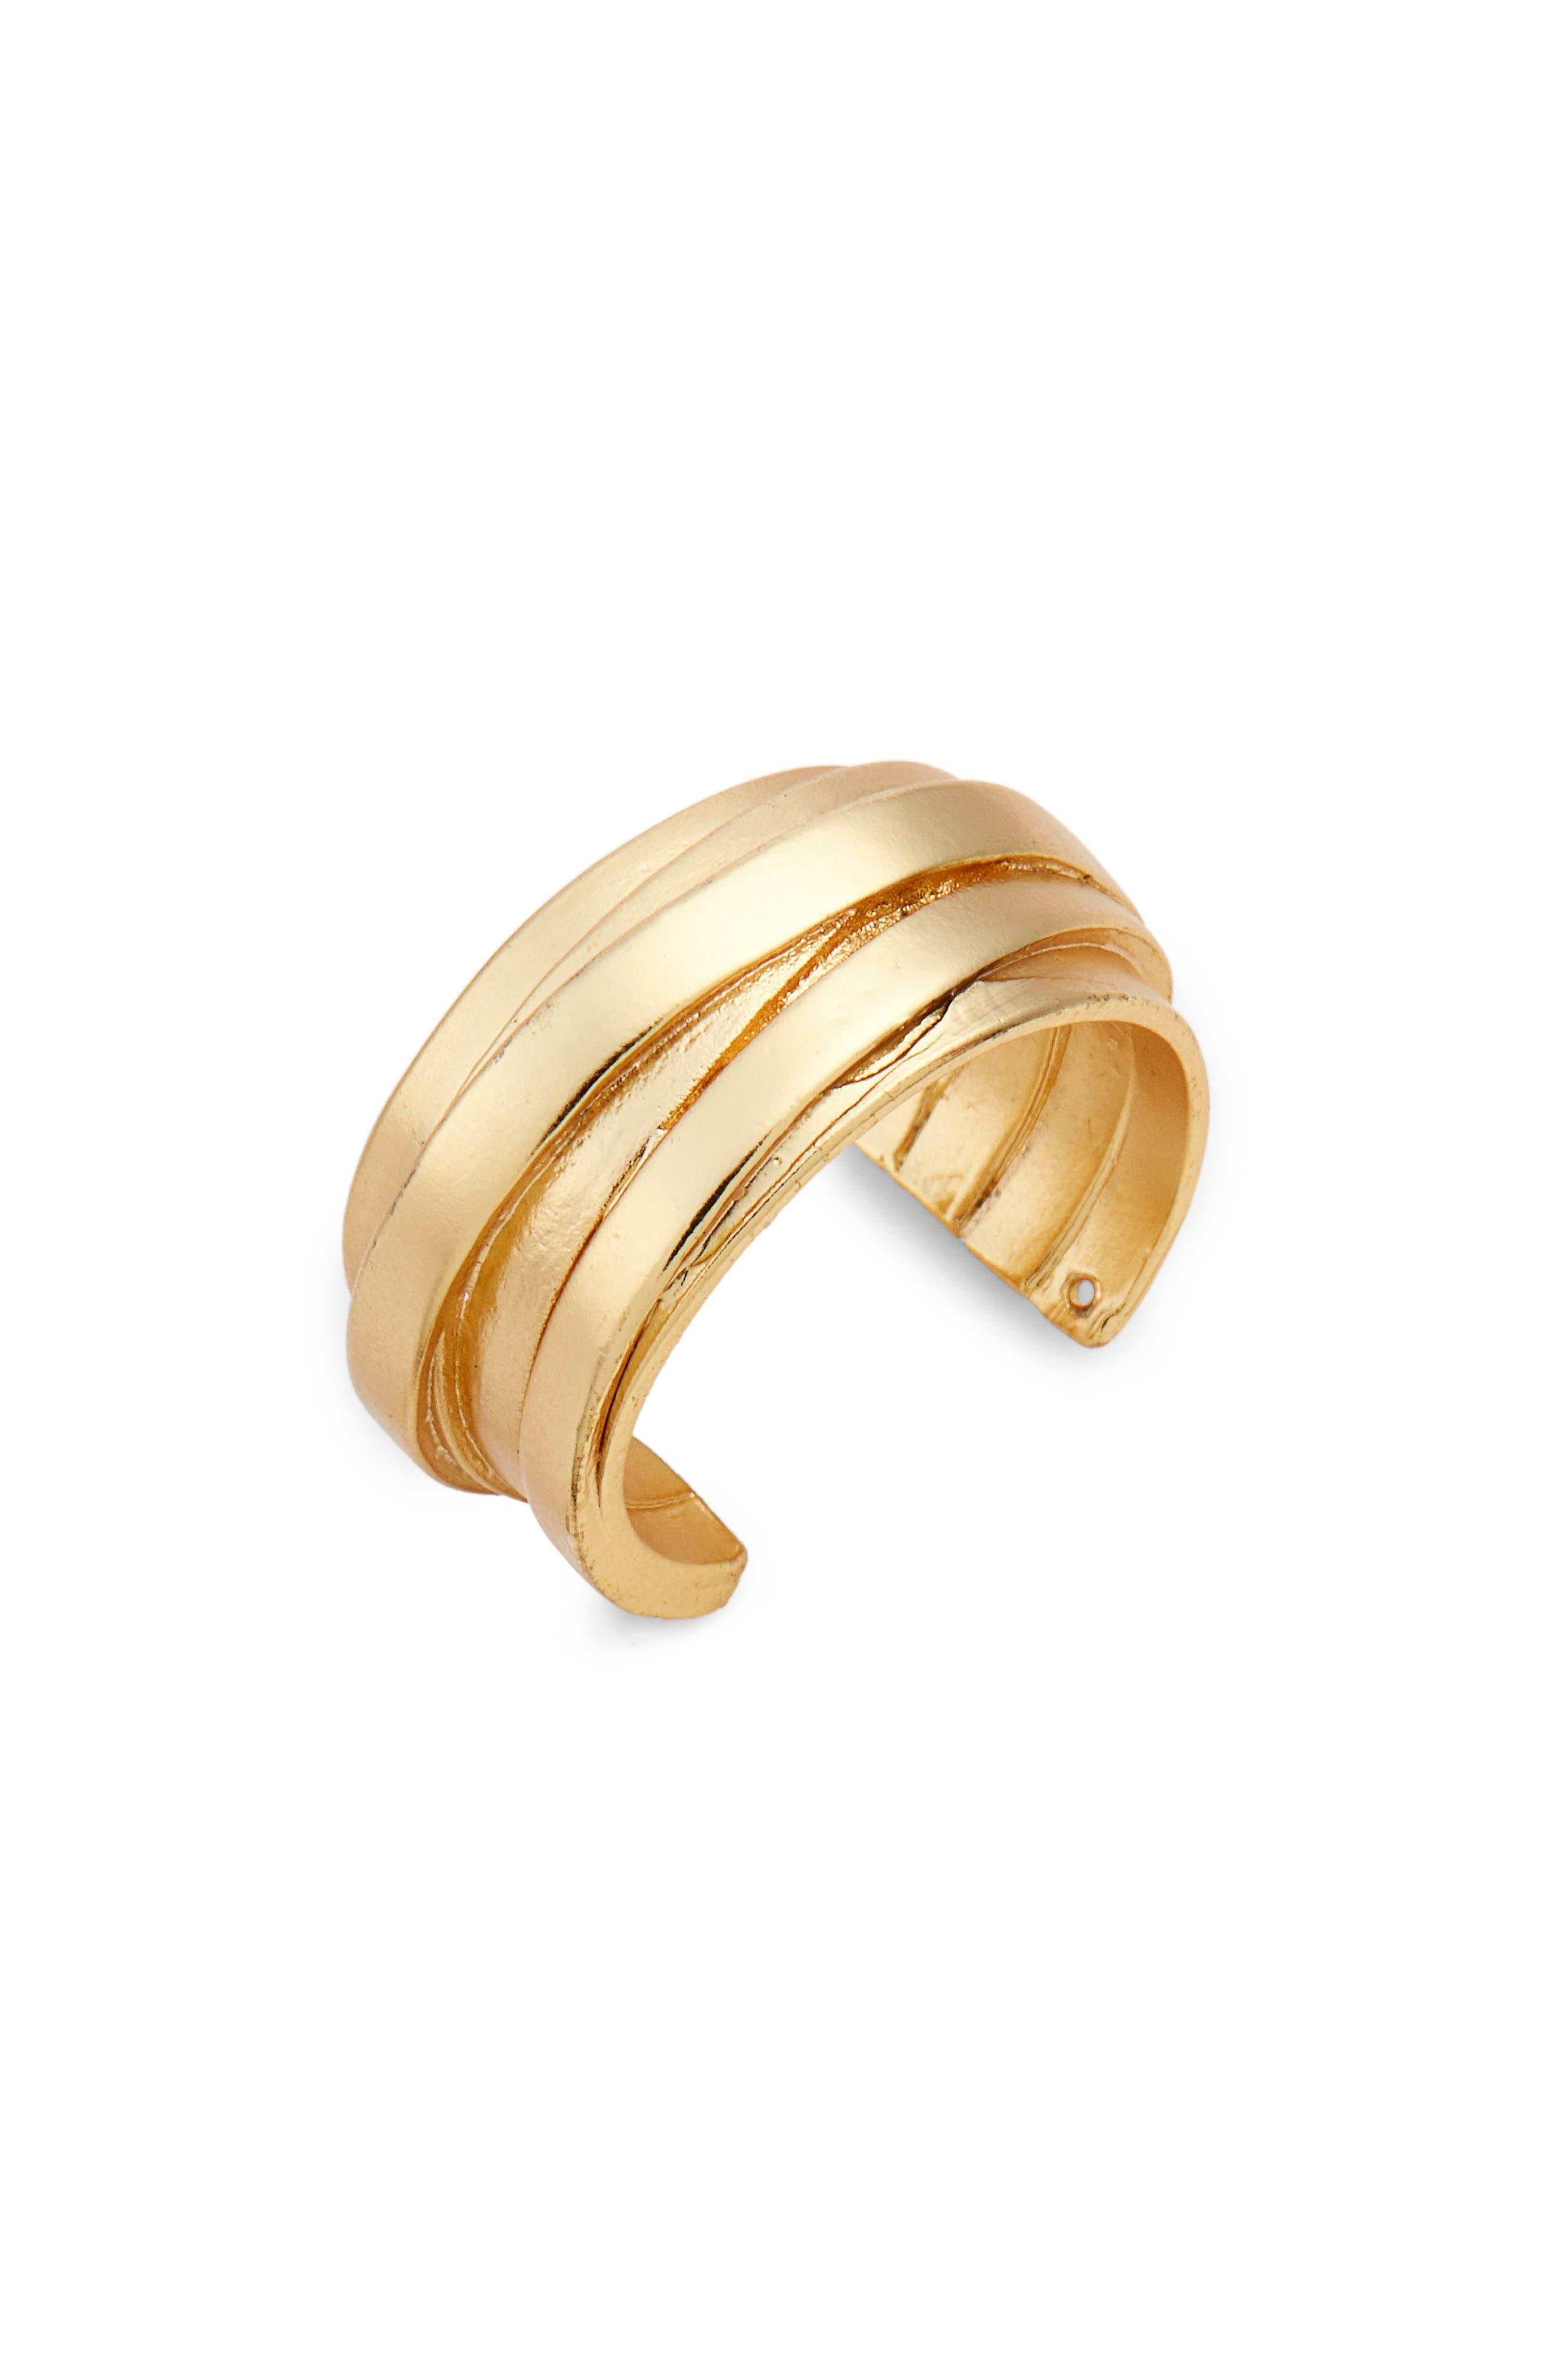 Karine Sultan Angelique Adjustable Ring